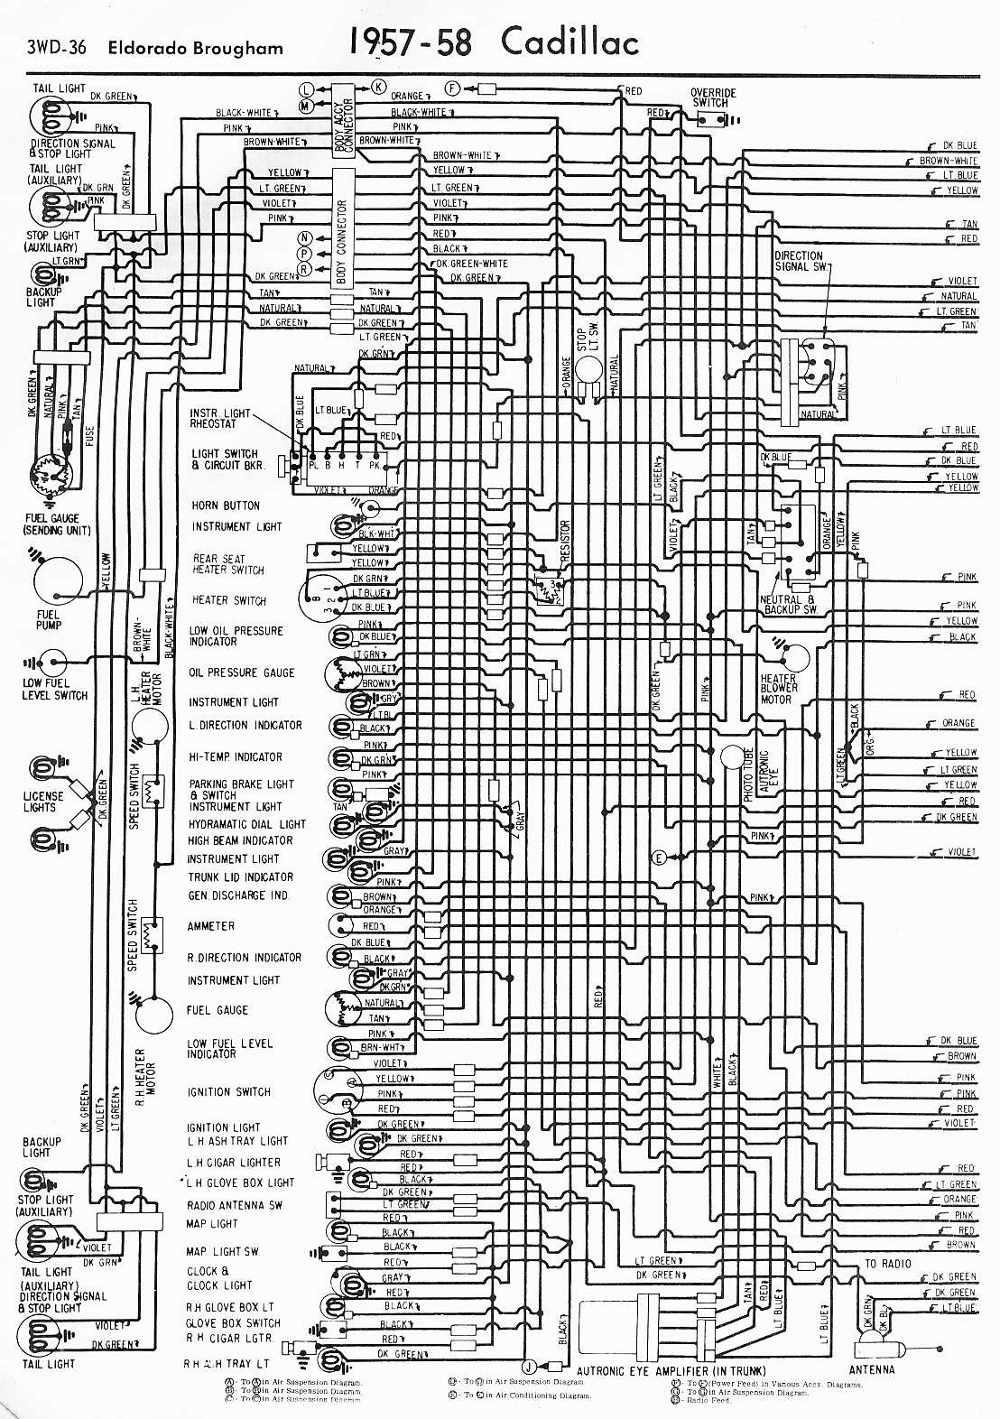 AK_2391] About Wiring Diagram Moreover 1990 Cadillac Eldorado Wiring Diagram  Free DiagramHabi Hutpa Unbe Hist Unbe Umize Hyedi Mohammedshrine Librar Wiring 101